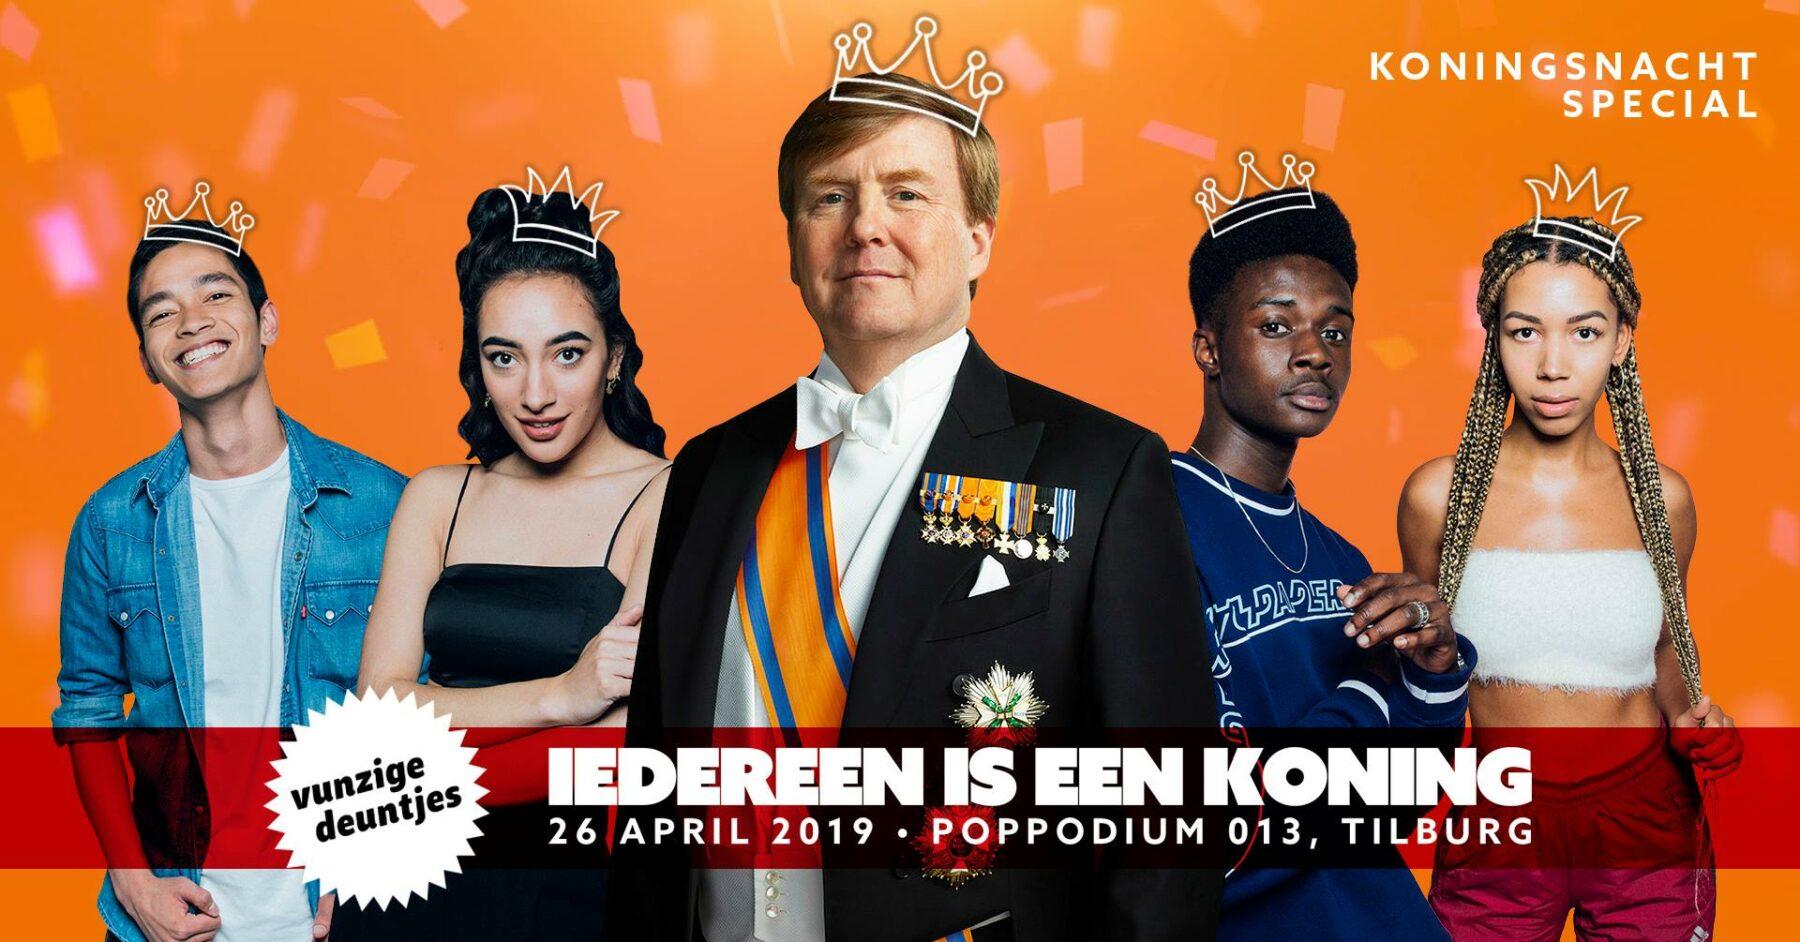 Koningsnacht 2019